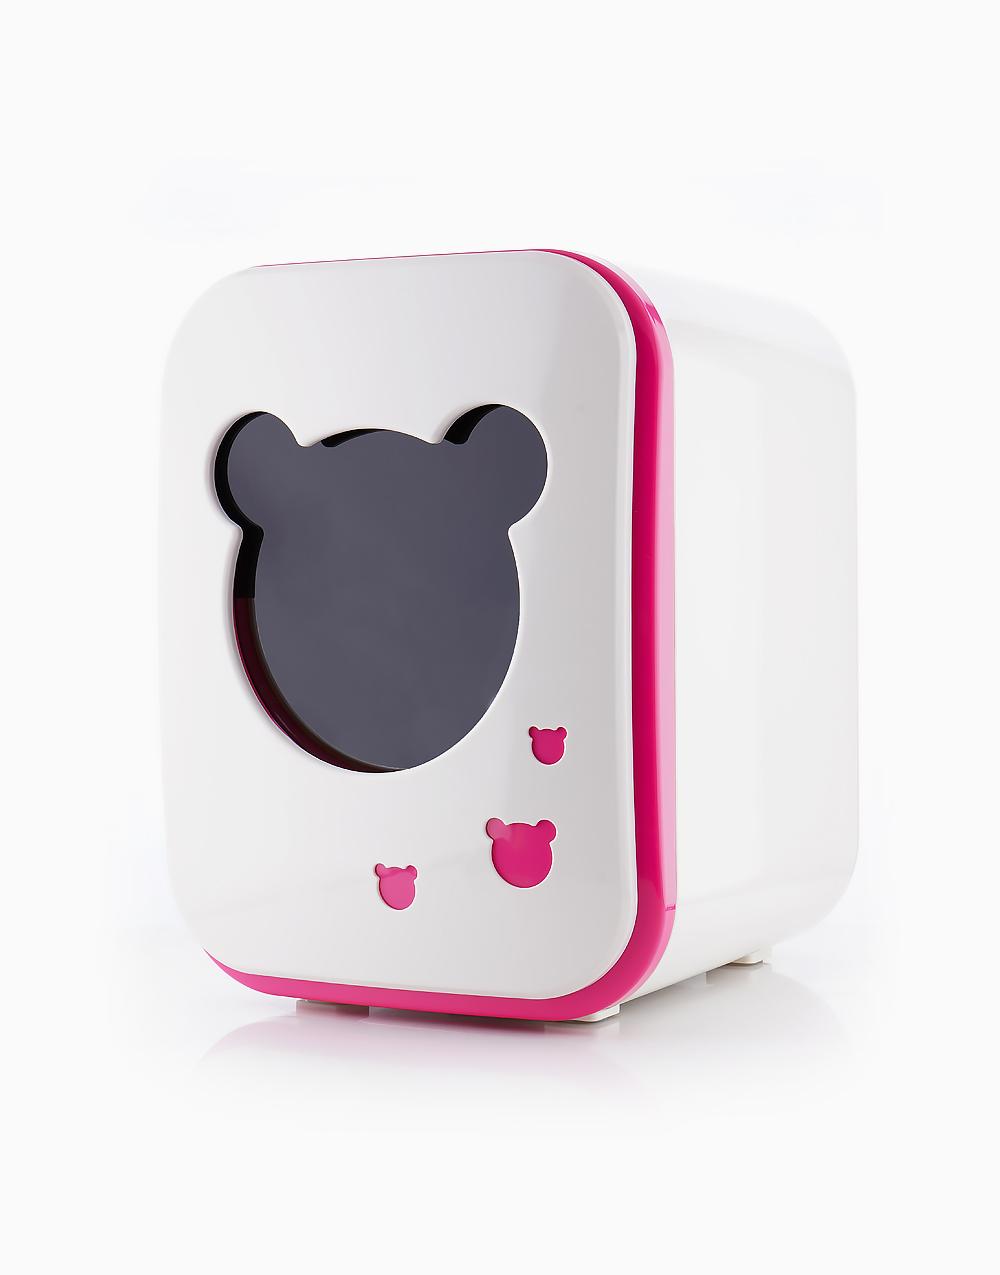 UV Sterilizer and Dryer in Barbie Pink by UVi Buddy